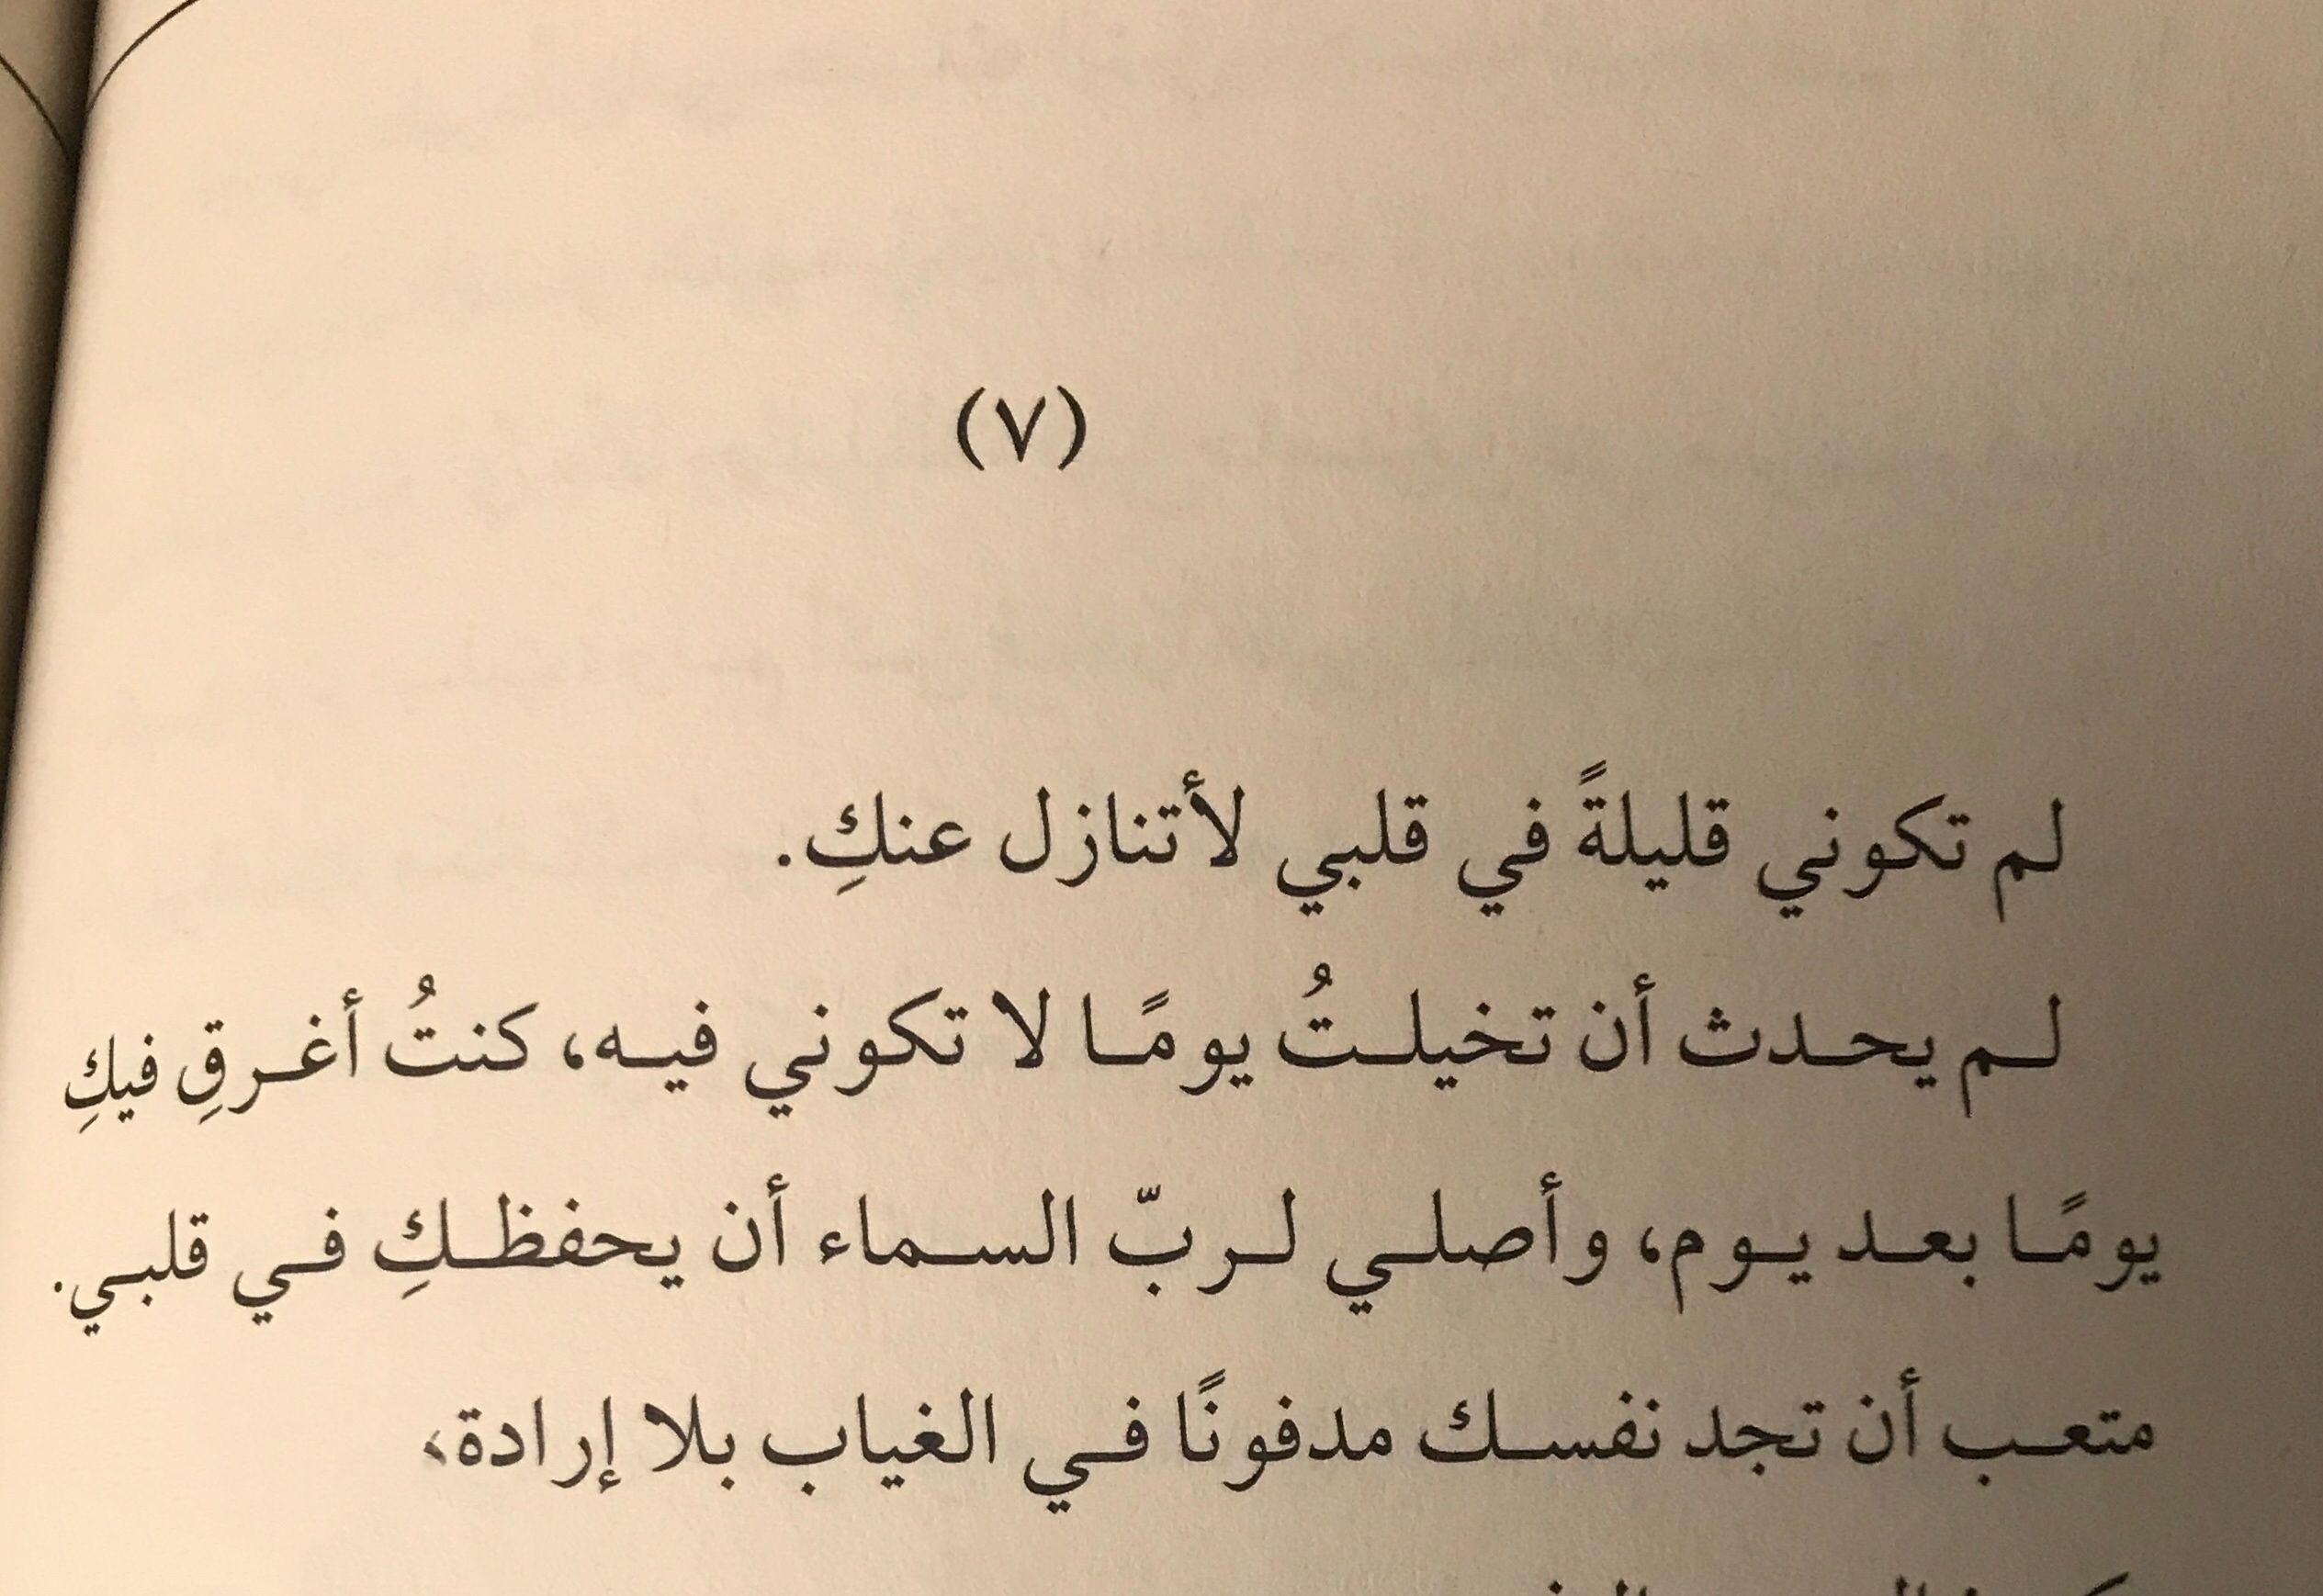 Pin By October On اقتباسات Arabic Calligraphy Calligraphy